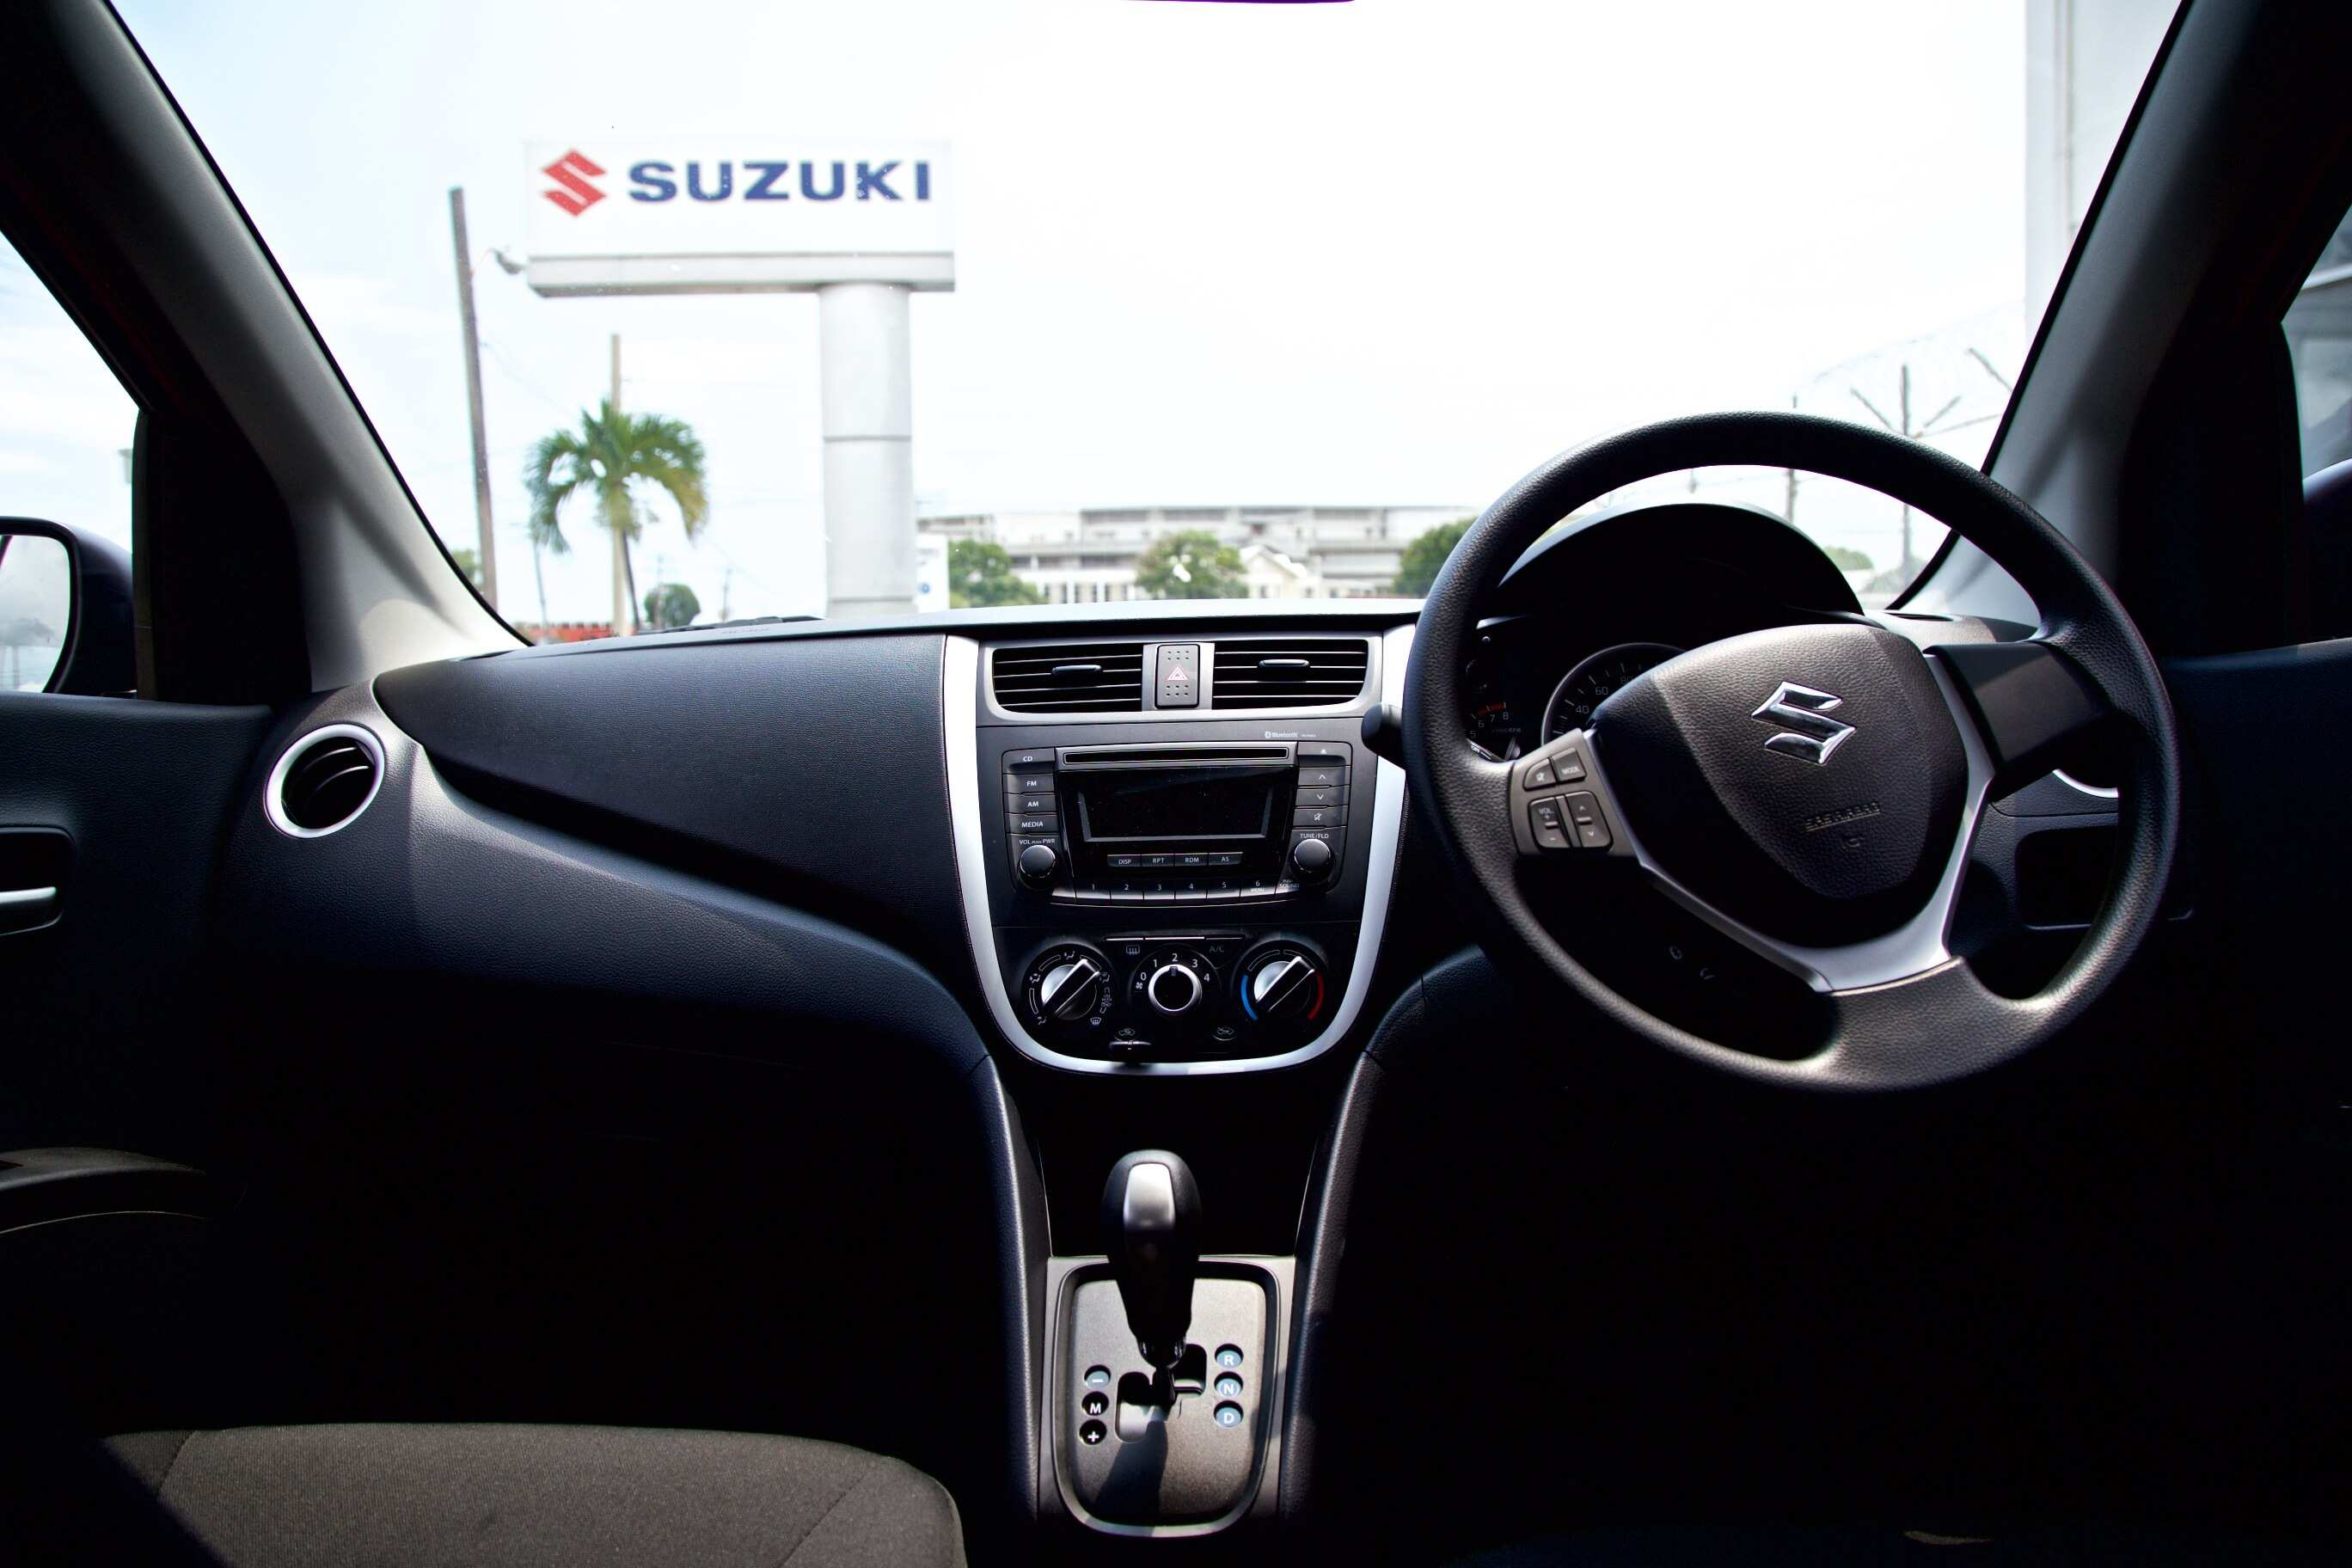 30 Gallery of Suzuki Celerio 2020 Specs and Review with Suzuki Celerio 2020